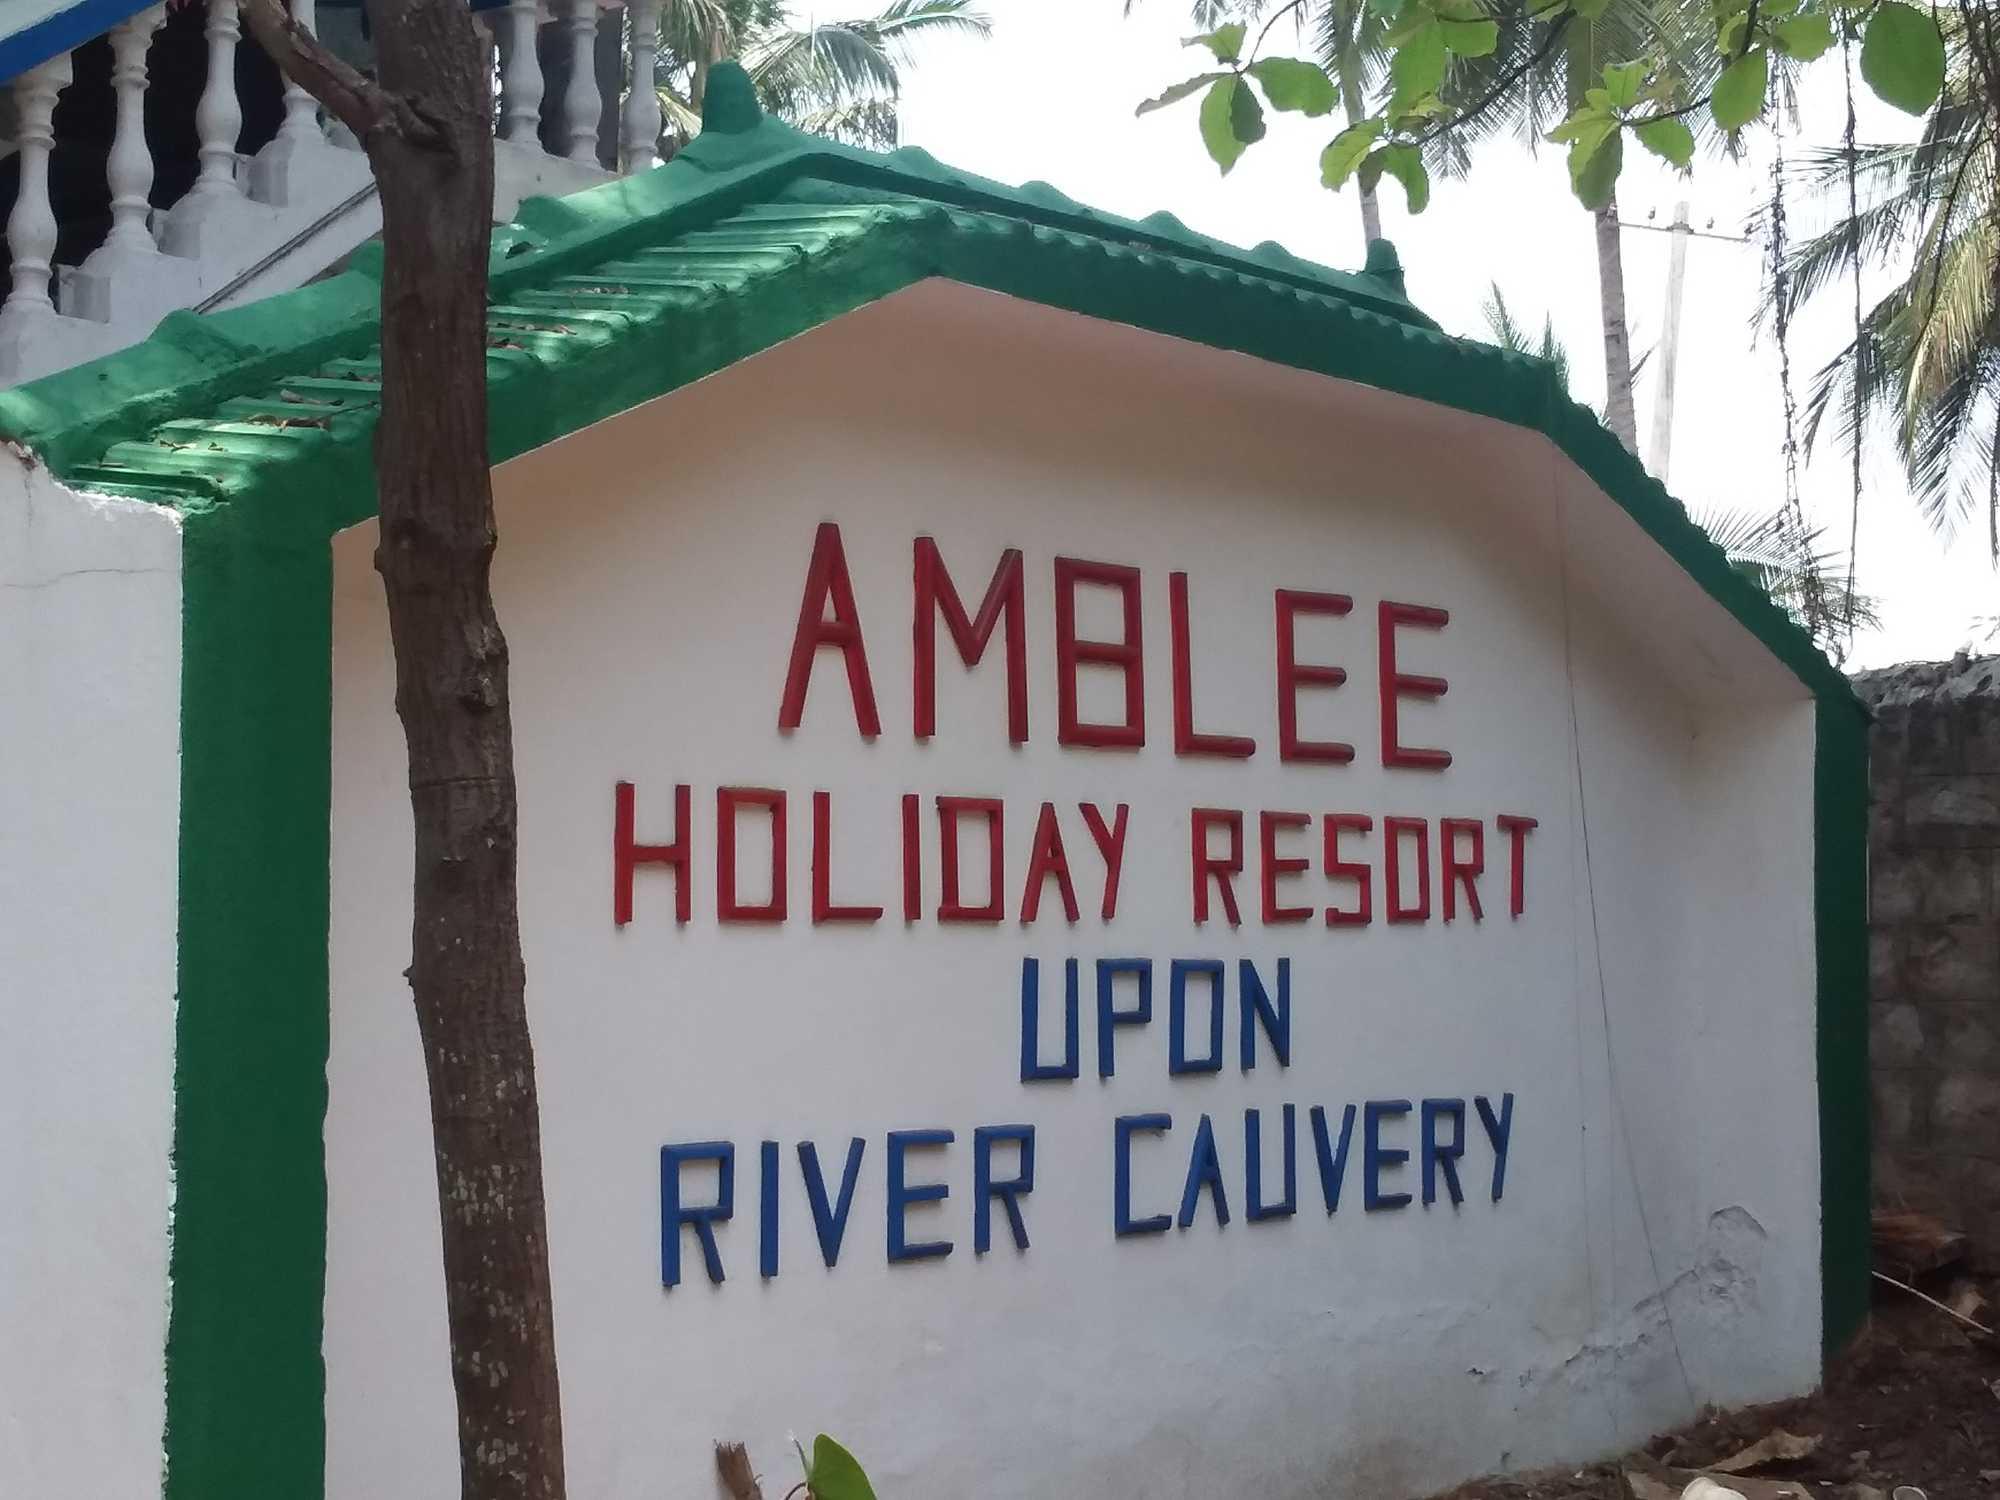 Amblee Holiday Resort - Mandya Image